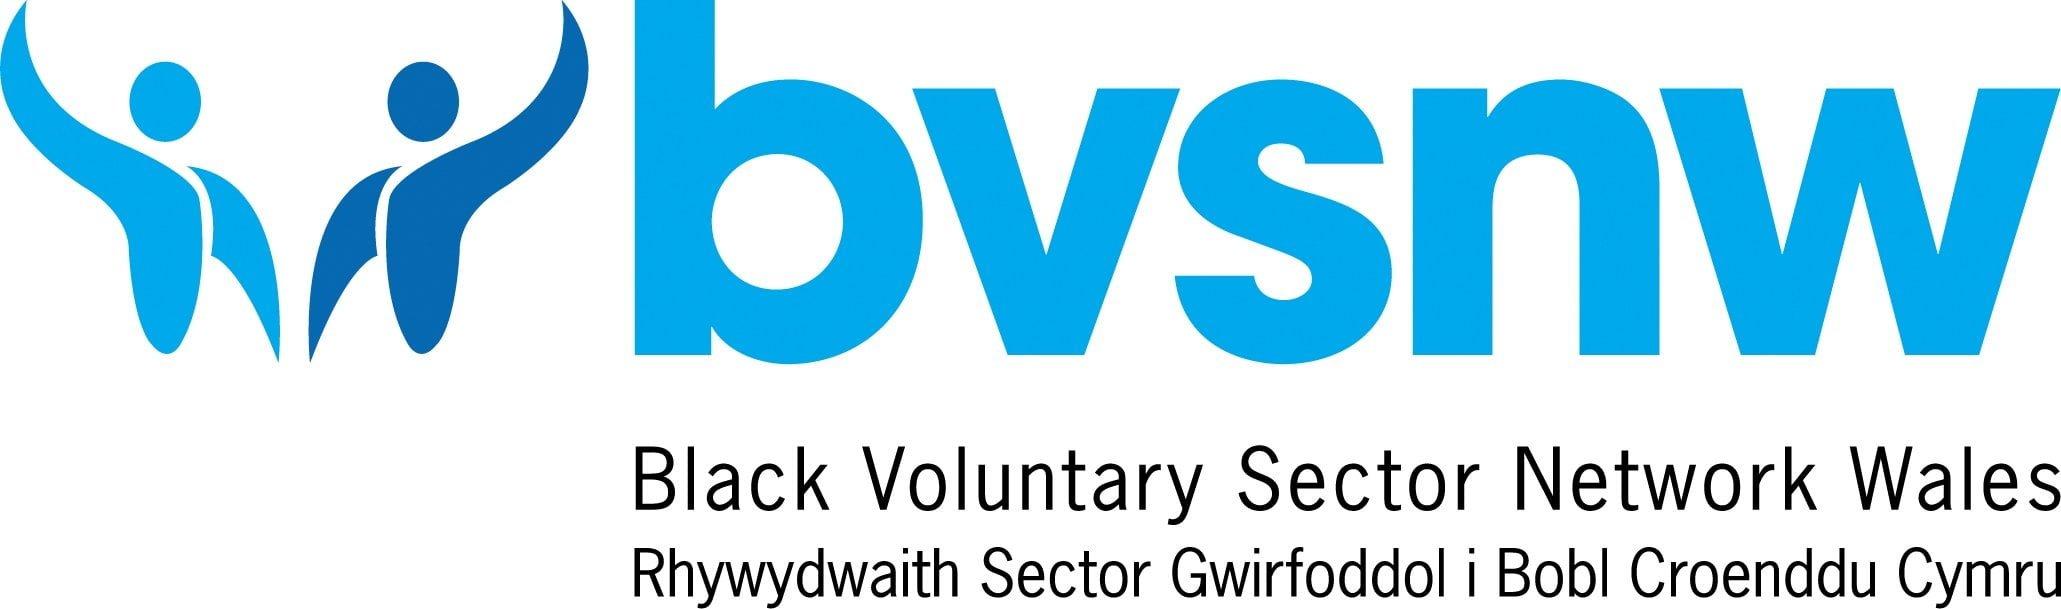 BVSNW-logo